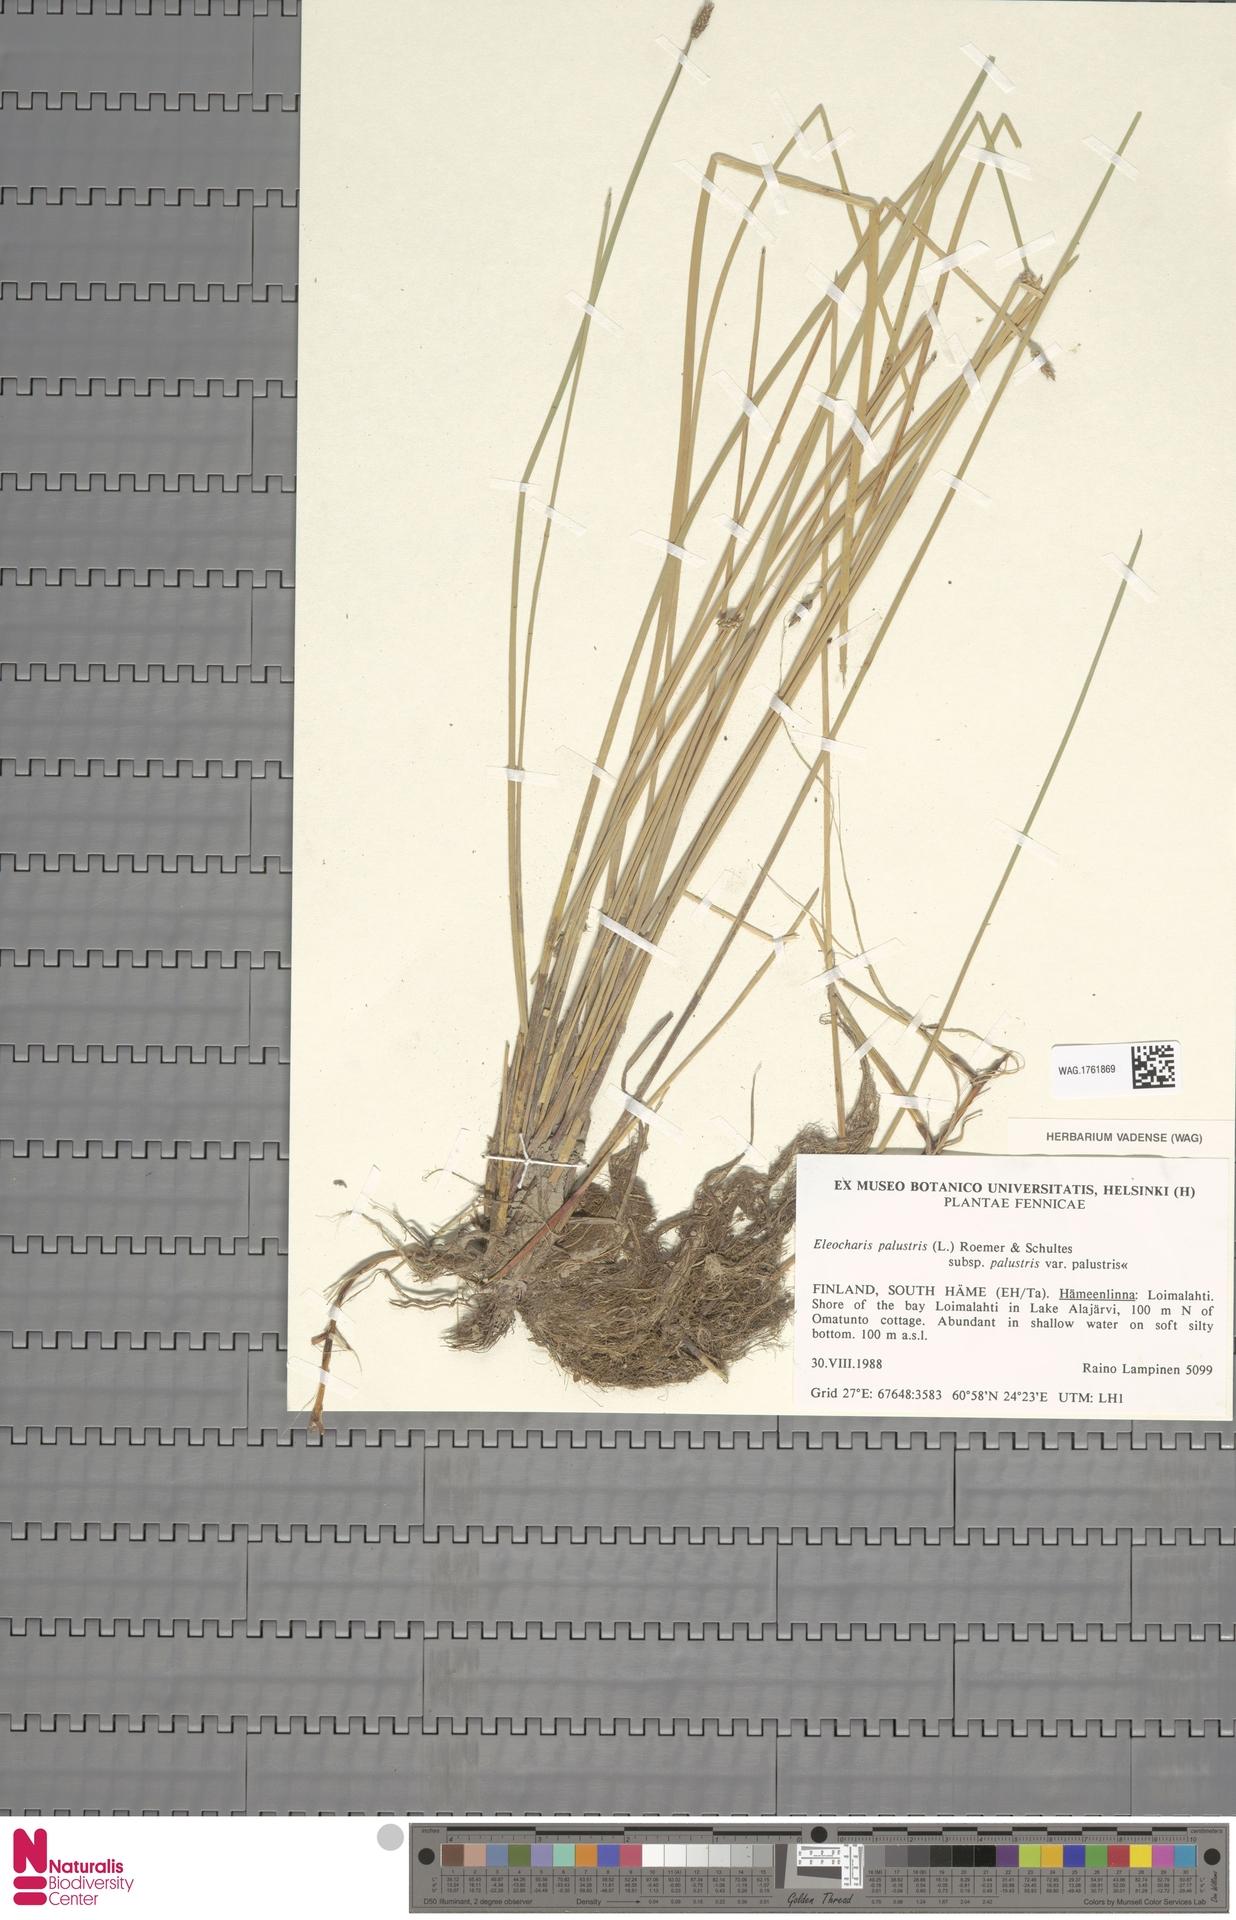 WAG.1761869   Eleocharis palustris subsp. palustris